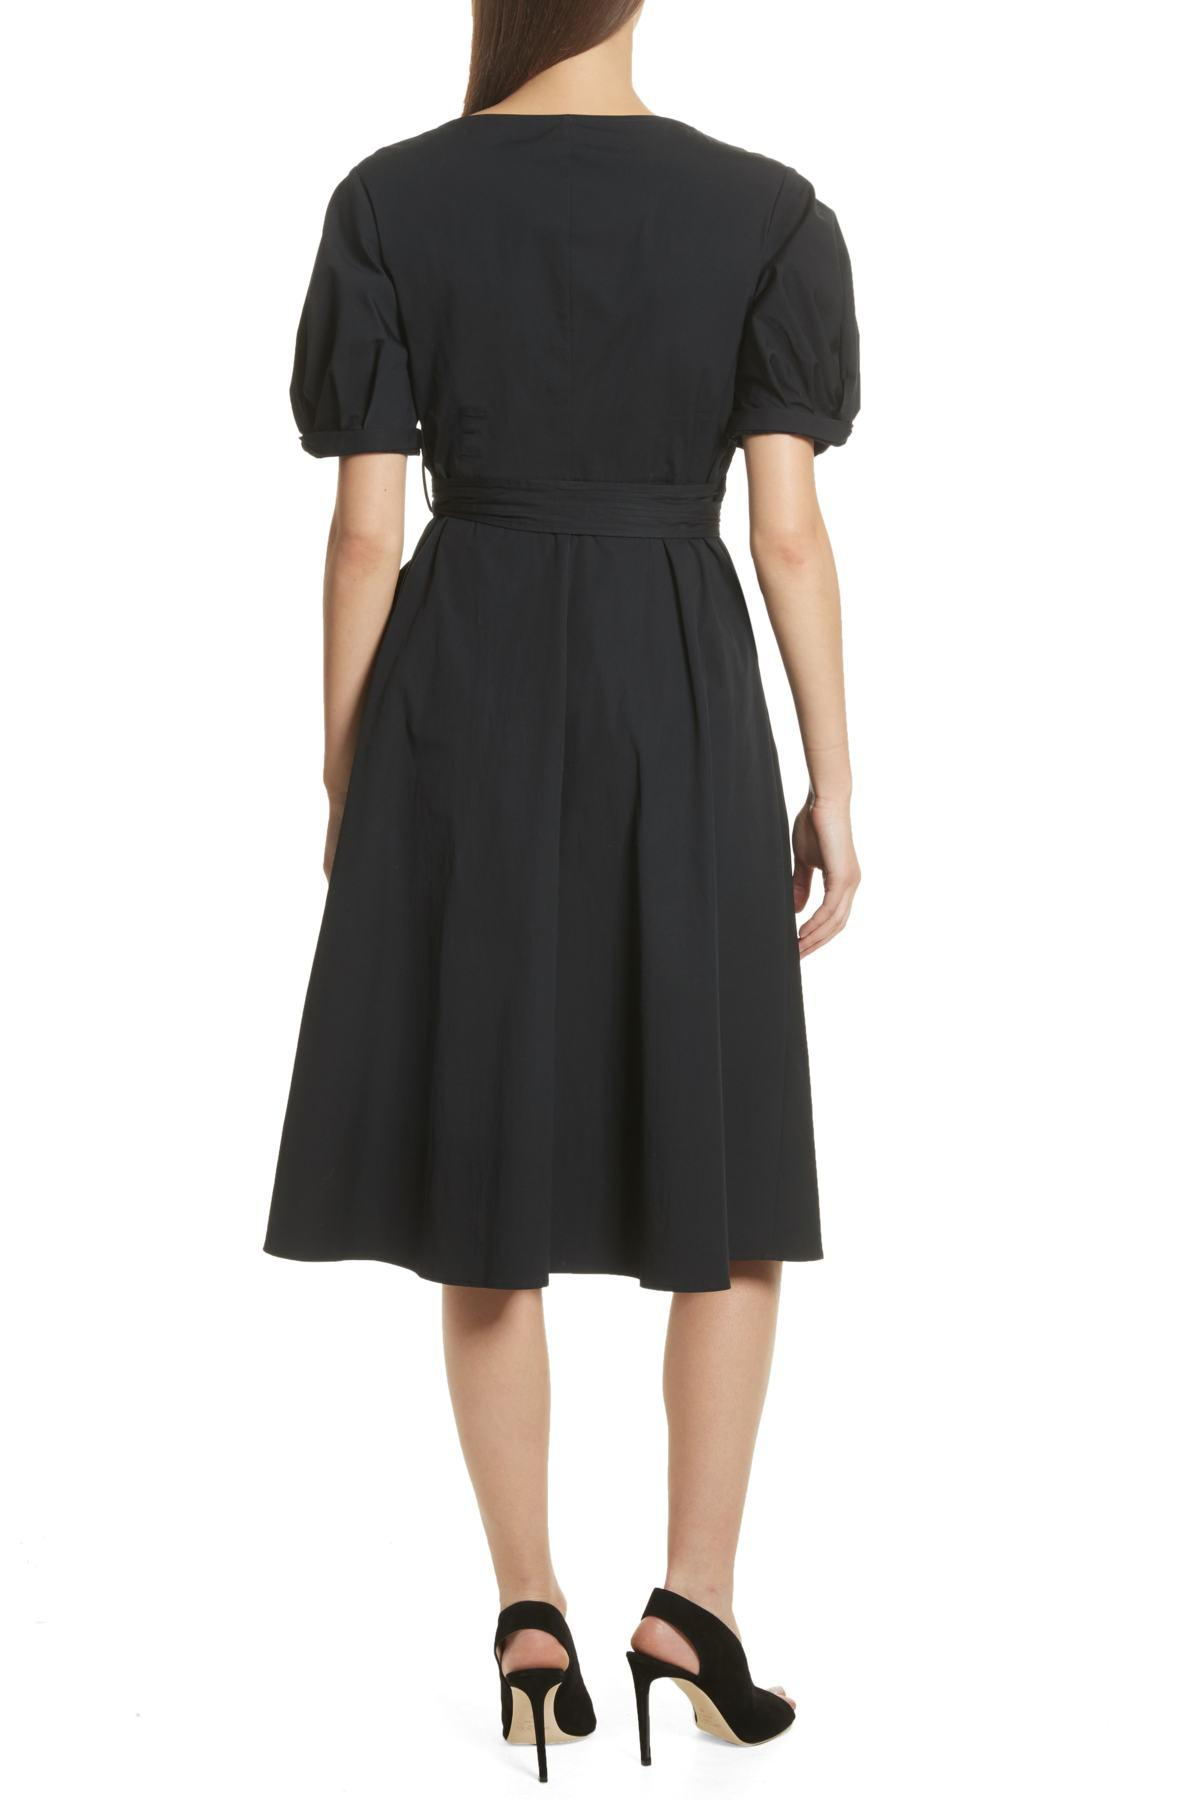 ba84b5f927 Lyst - A.L.C. Meghan Wrap Dress in Black